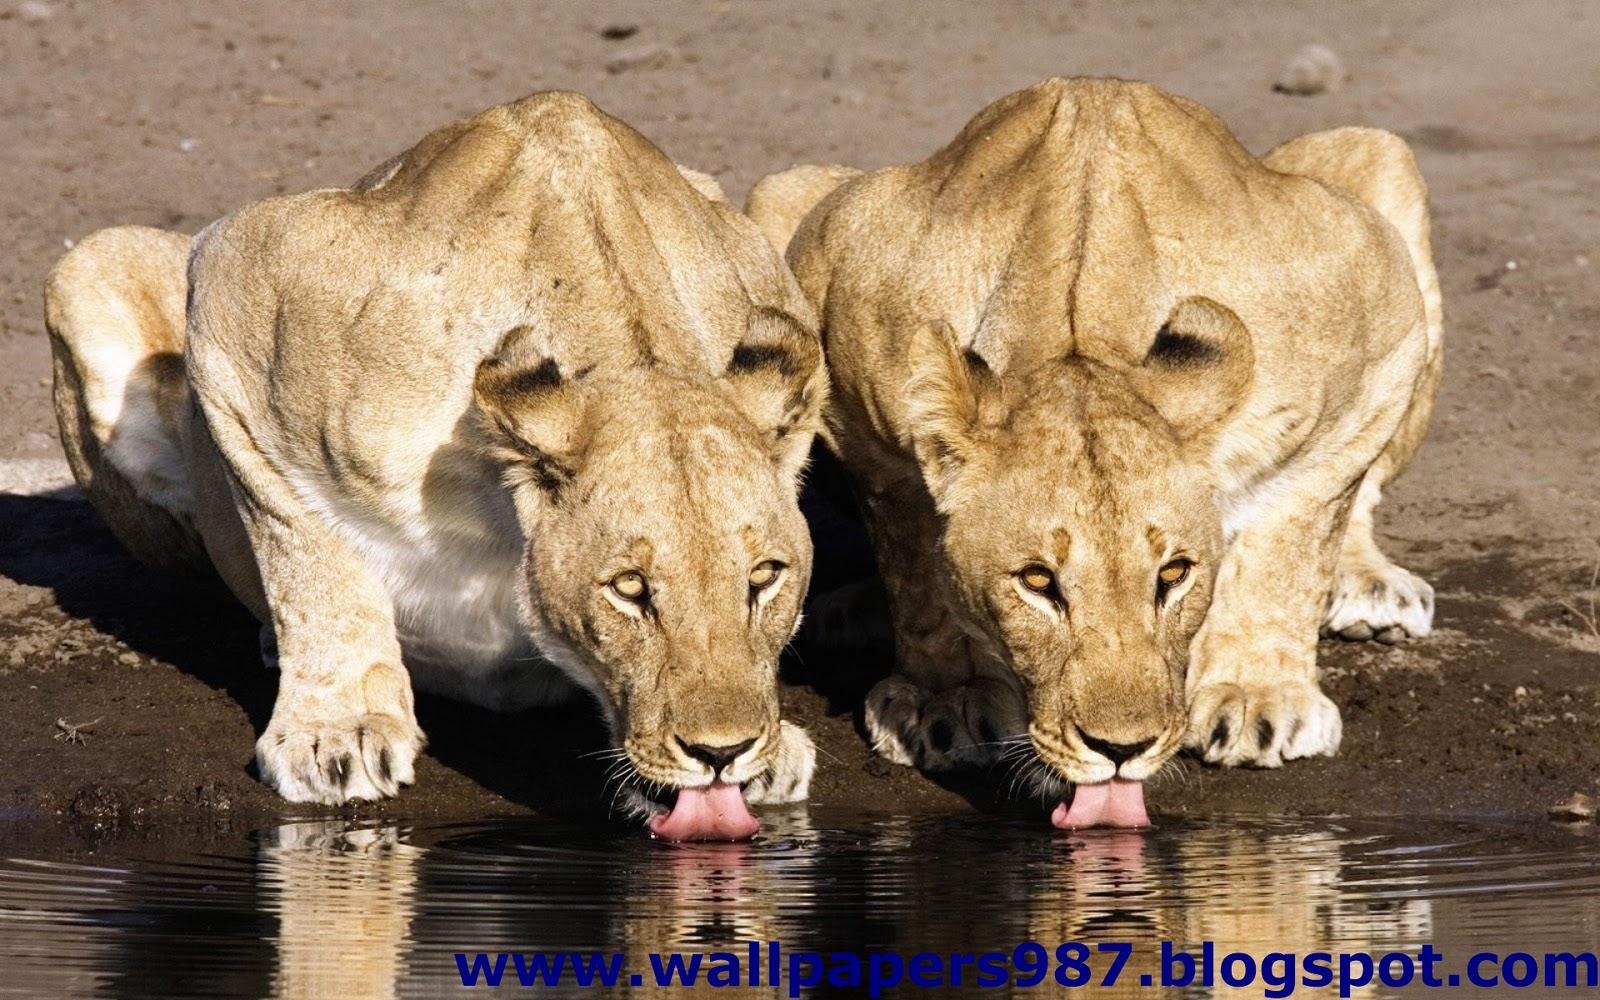 http://3.bp.blogspot.com/_SOSNZoTv8ng/TQYXlCnjv8I/AAAAAAAAAHk/2MO0fjp9KtA/s1600/windows_masaustu_arka_plan_resimleri_vahsi_kediler_aslan_kaplan_HD_HQ_Full_Animal.+Pic+%2528199%2529.jpg